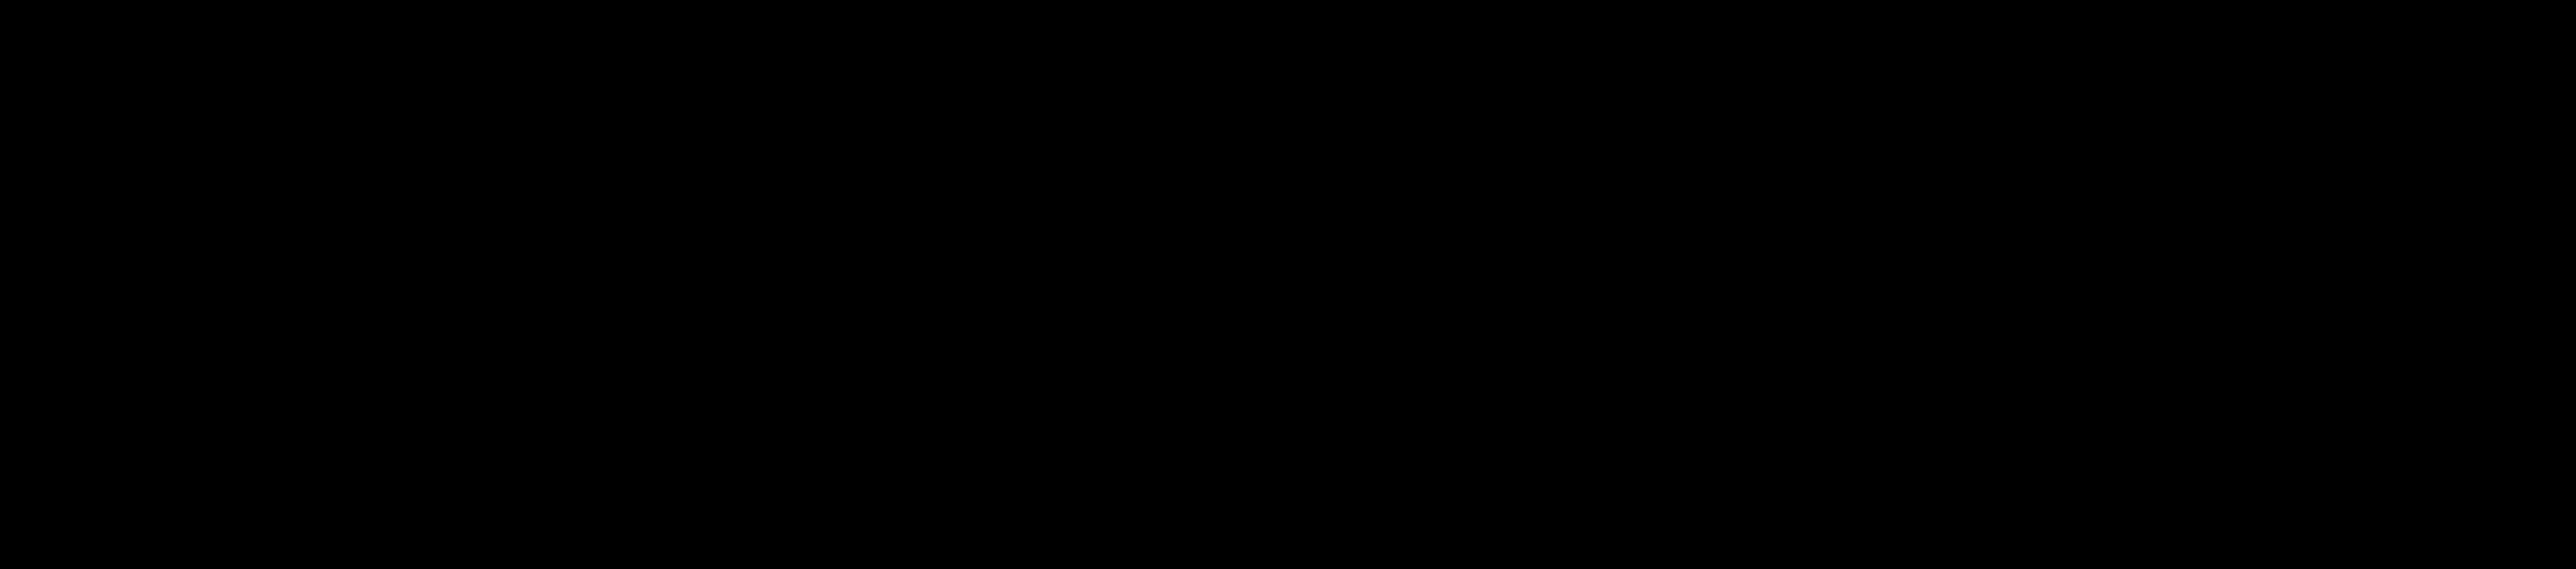 rappibank logo - RappiBank Logo